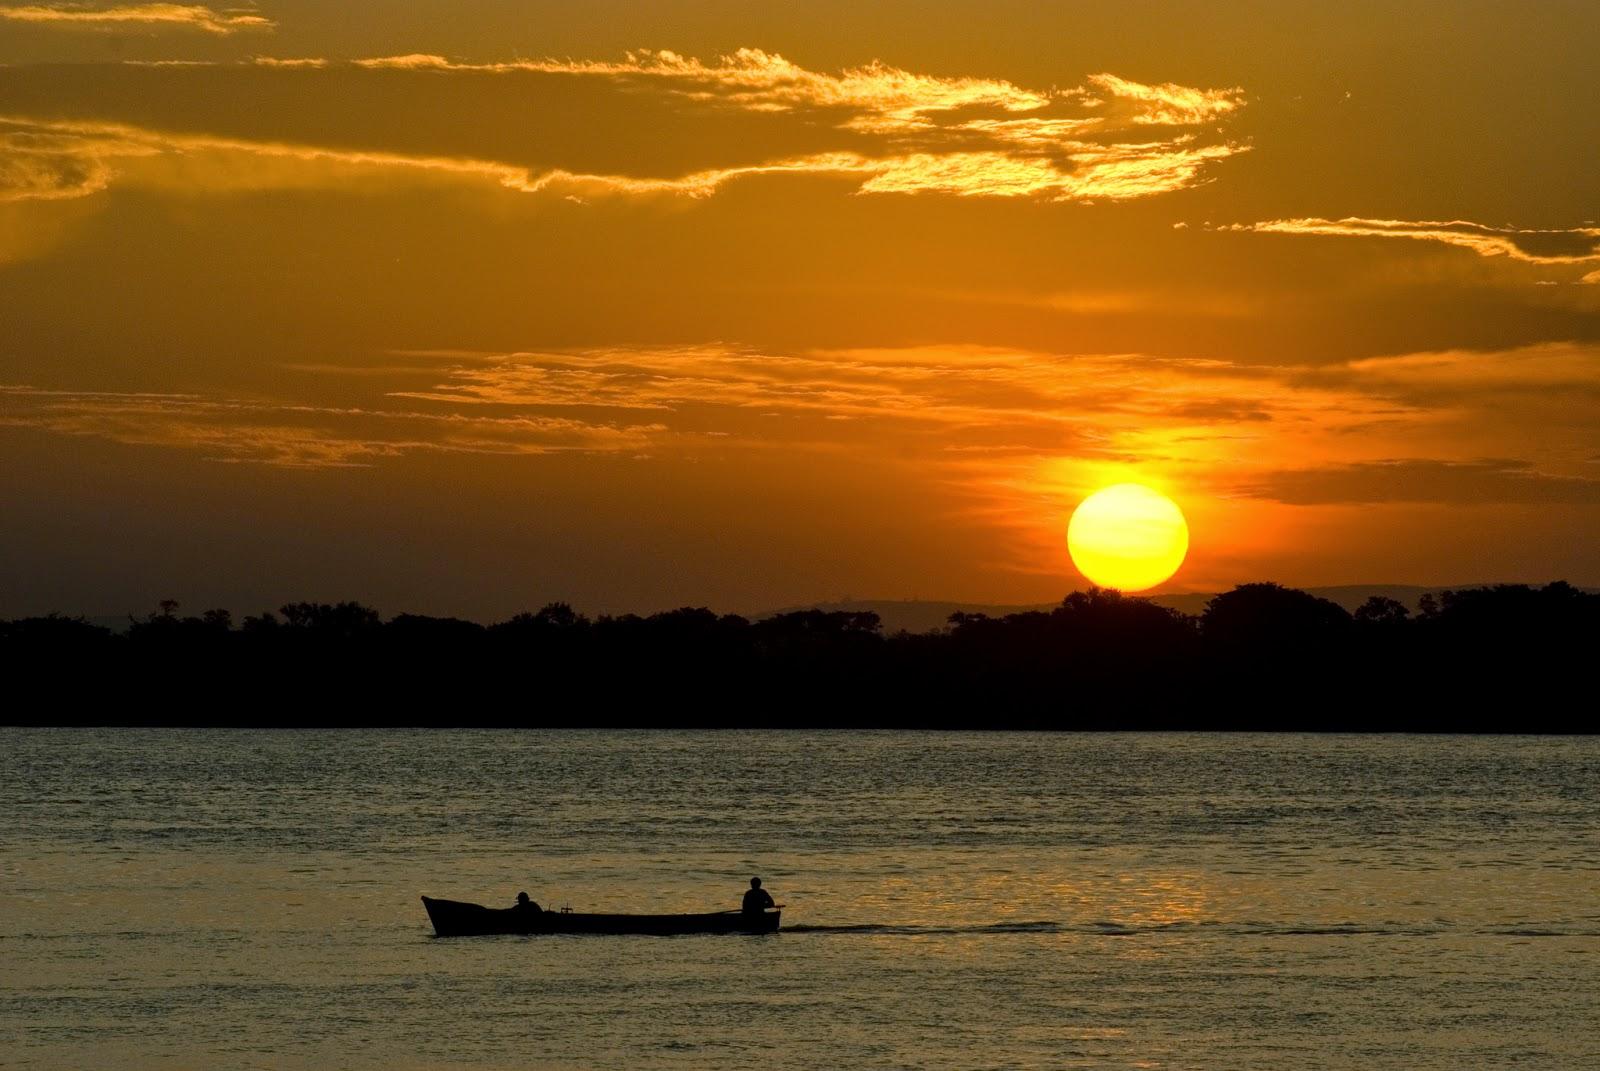 porto alegre rio grande do sul por do sol guaíba